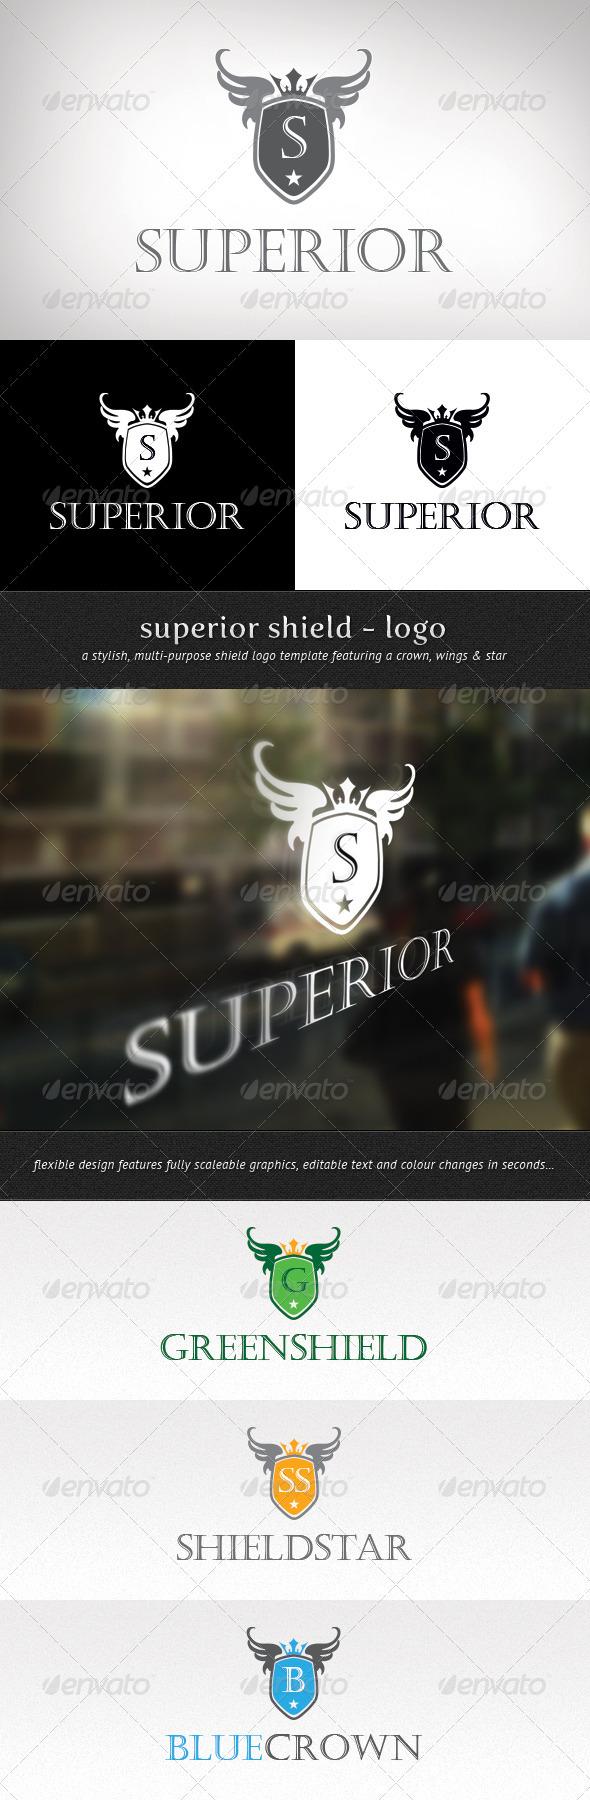 GraphicRiver Superior Shield Logo 3455843